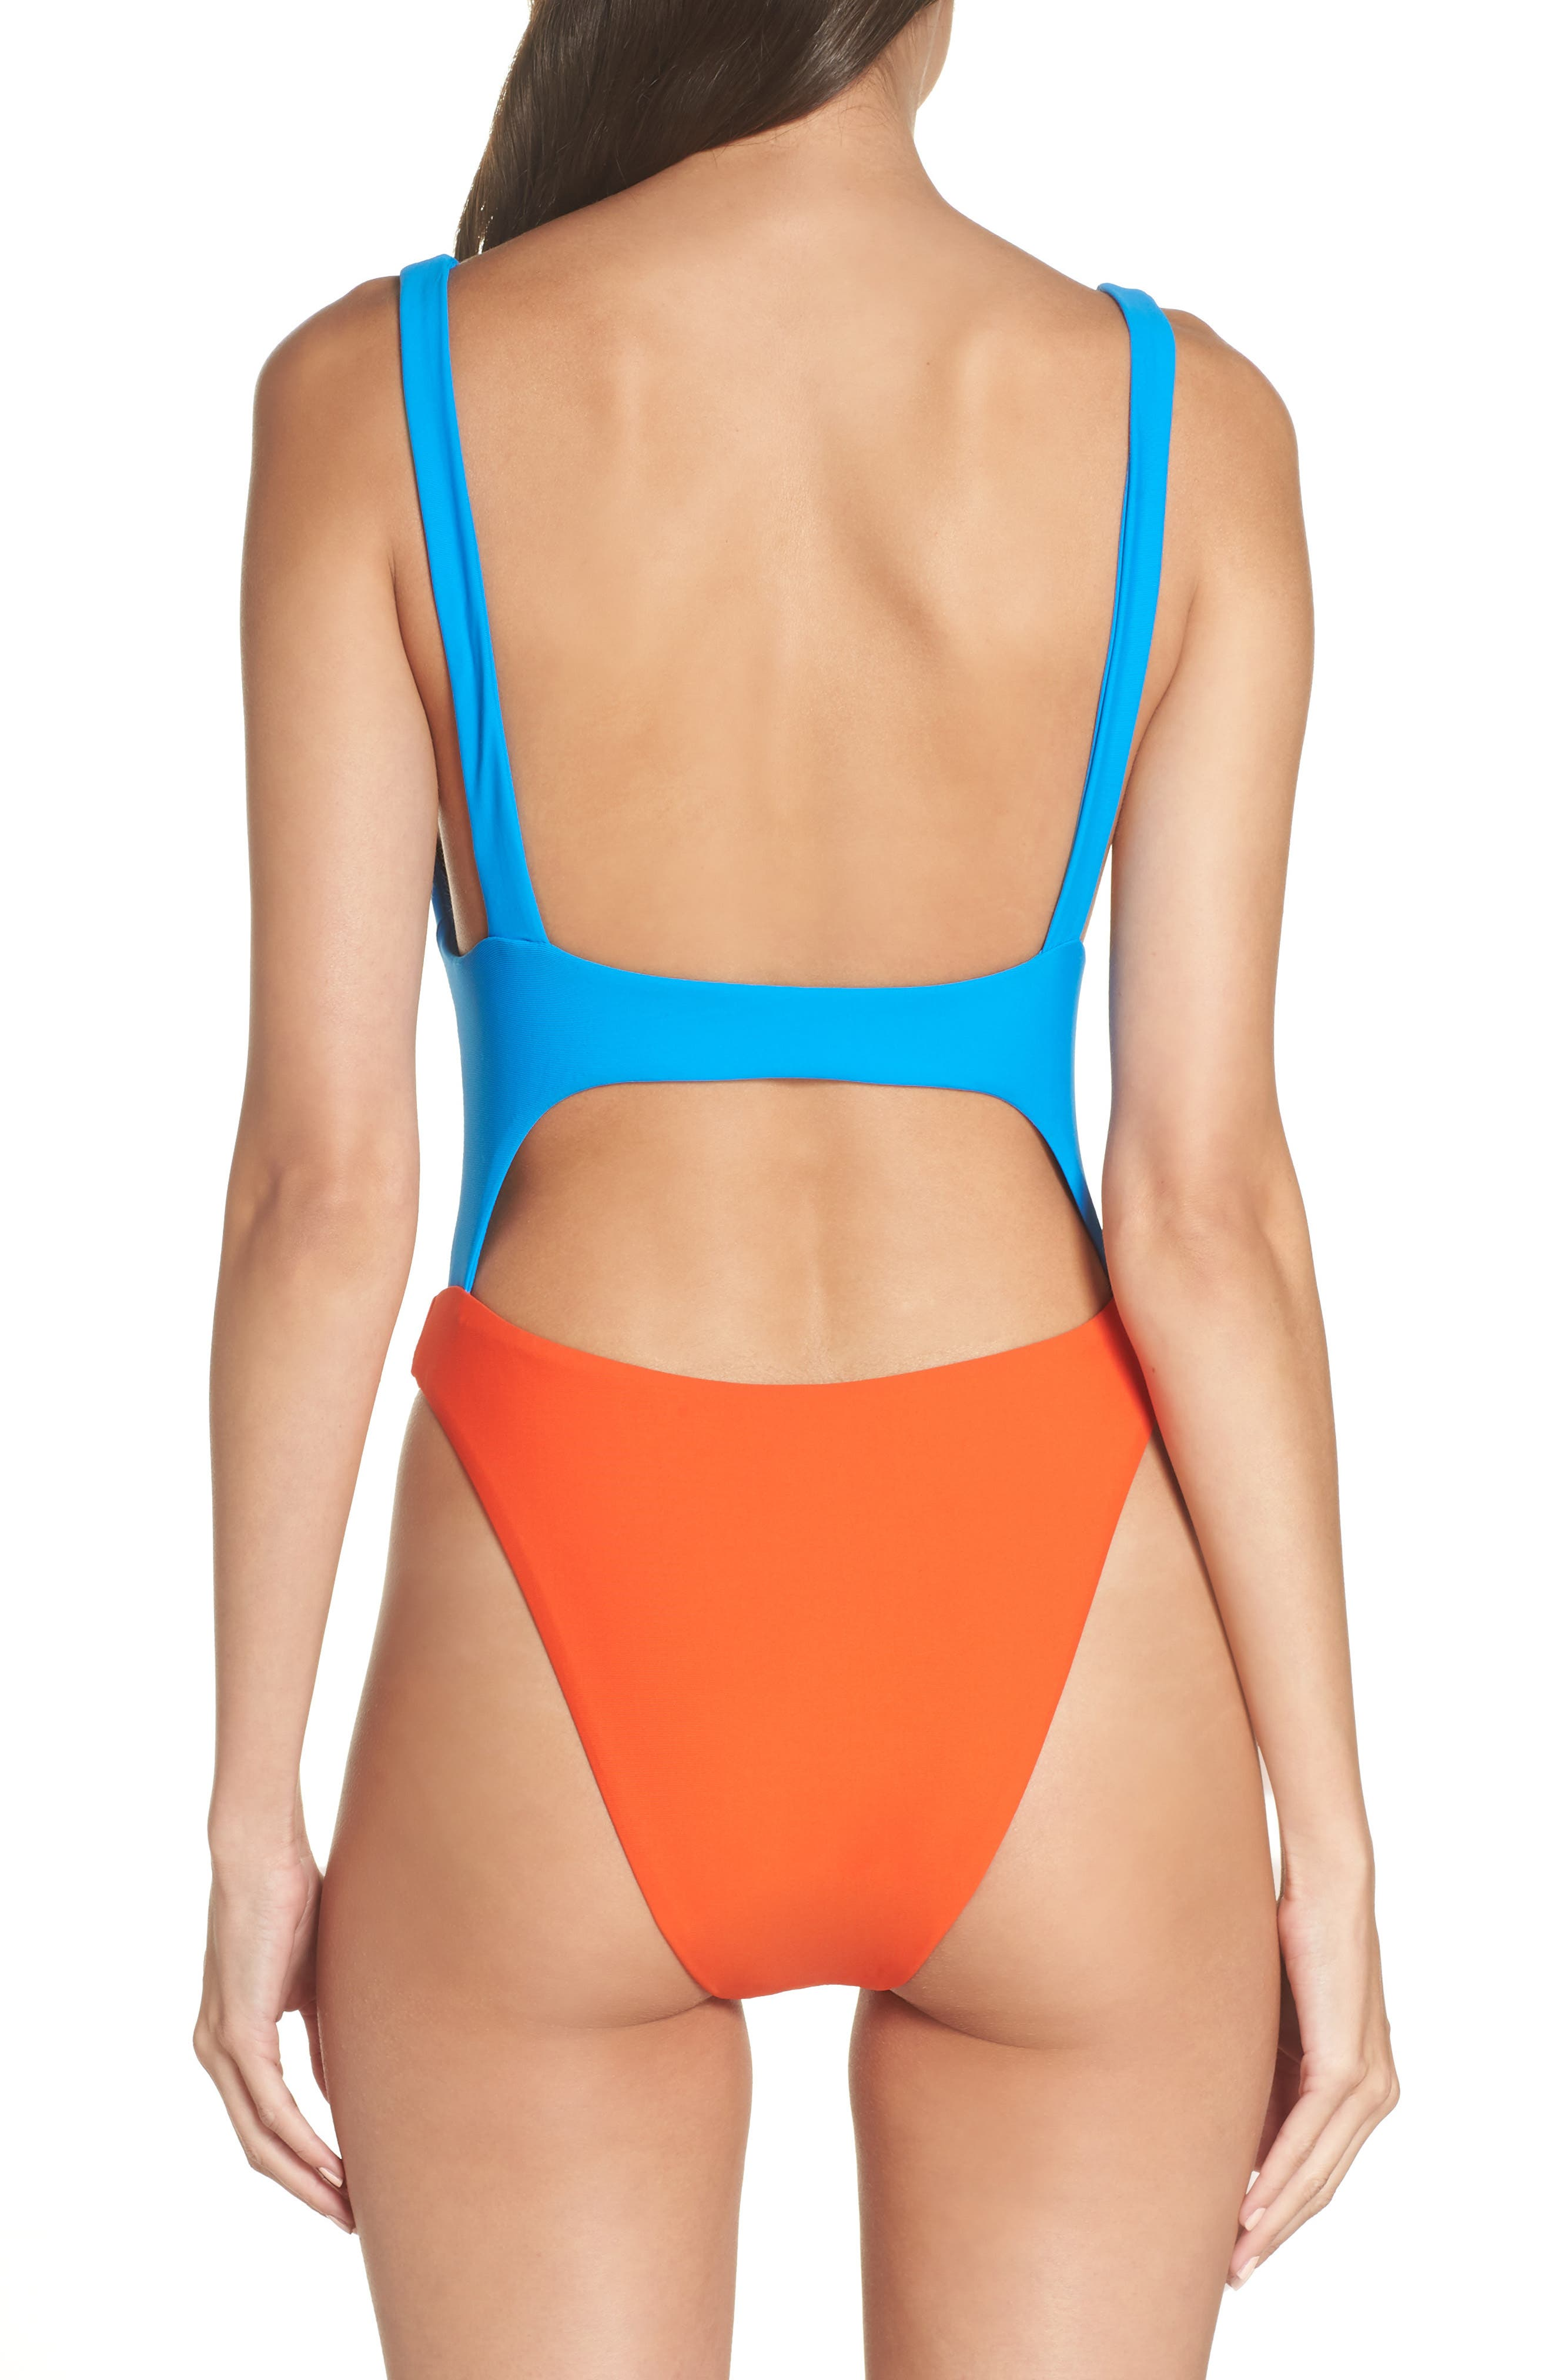 LEITH, Colorblock One-Piece Swimsuit, Alternate thumbnail 2, color, 420